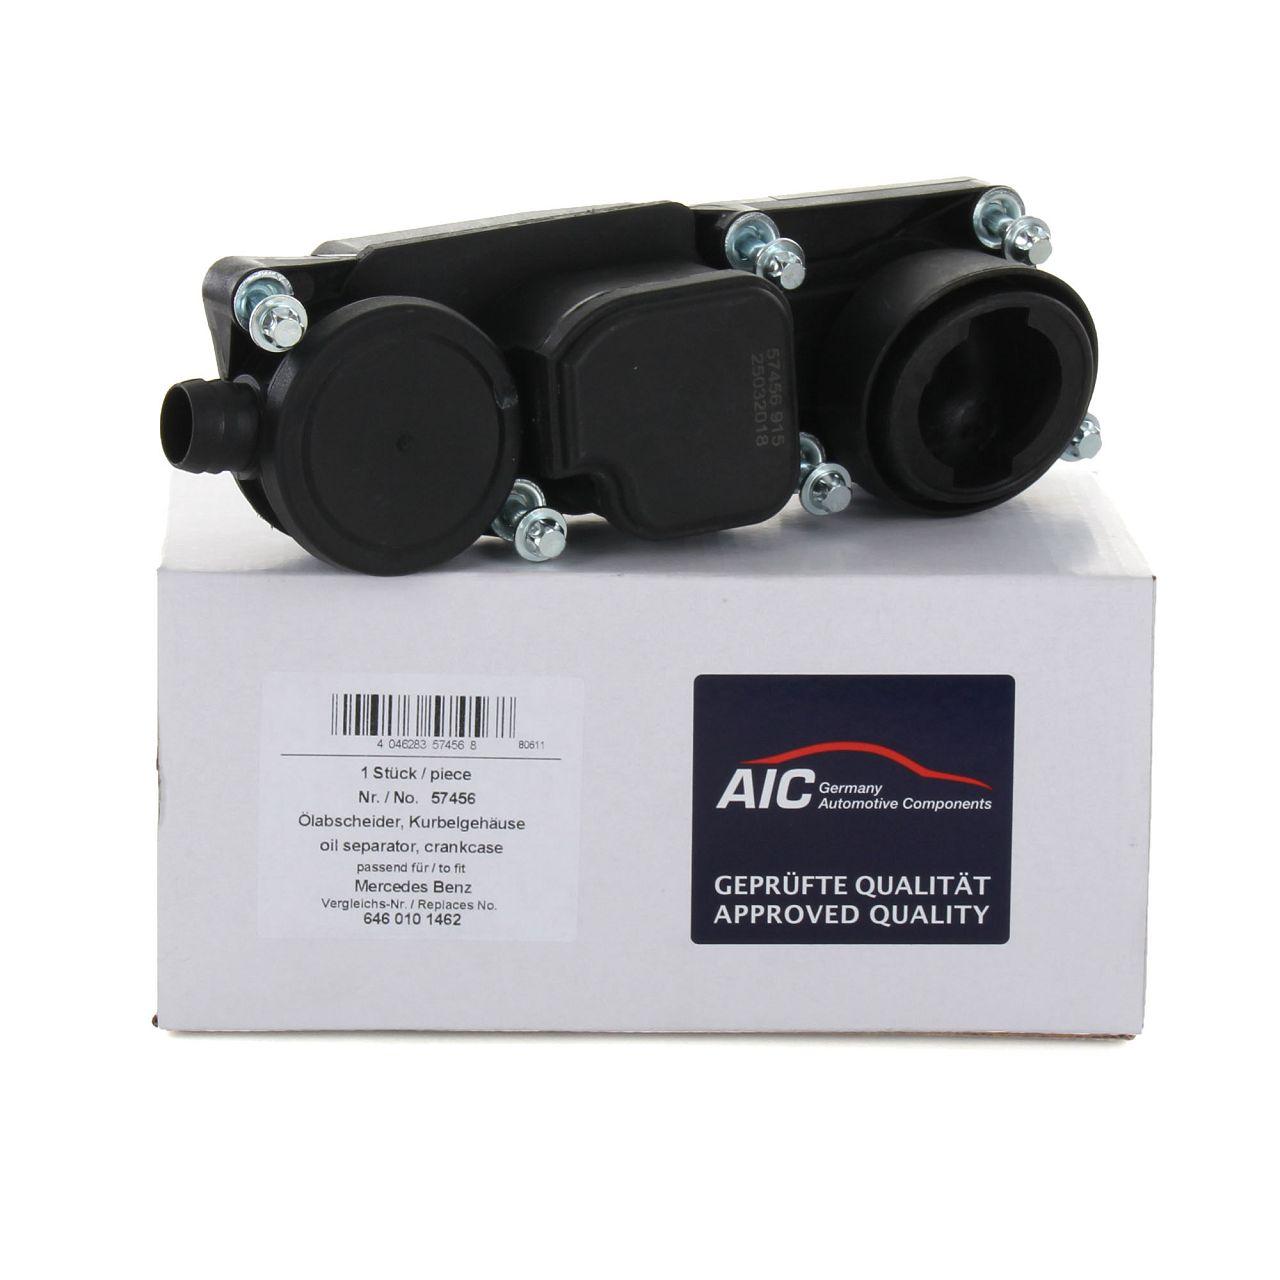 AIC Ölabscheider Kurbelgehäuseentlüftung MERCEDES W203 C209 W211 W220 200-320CDI